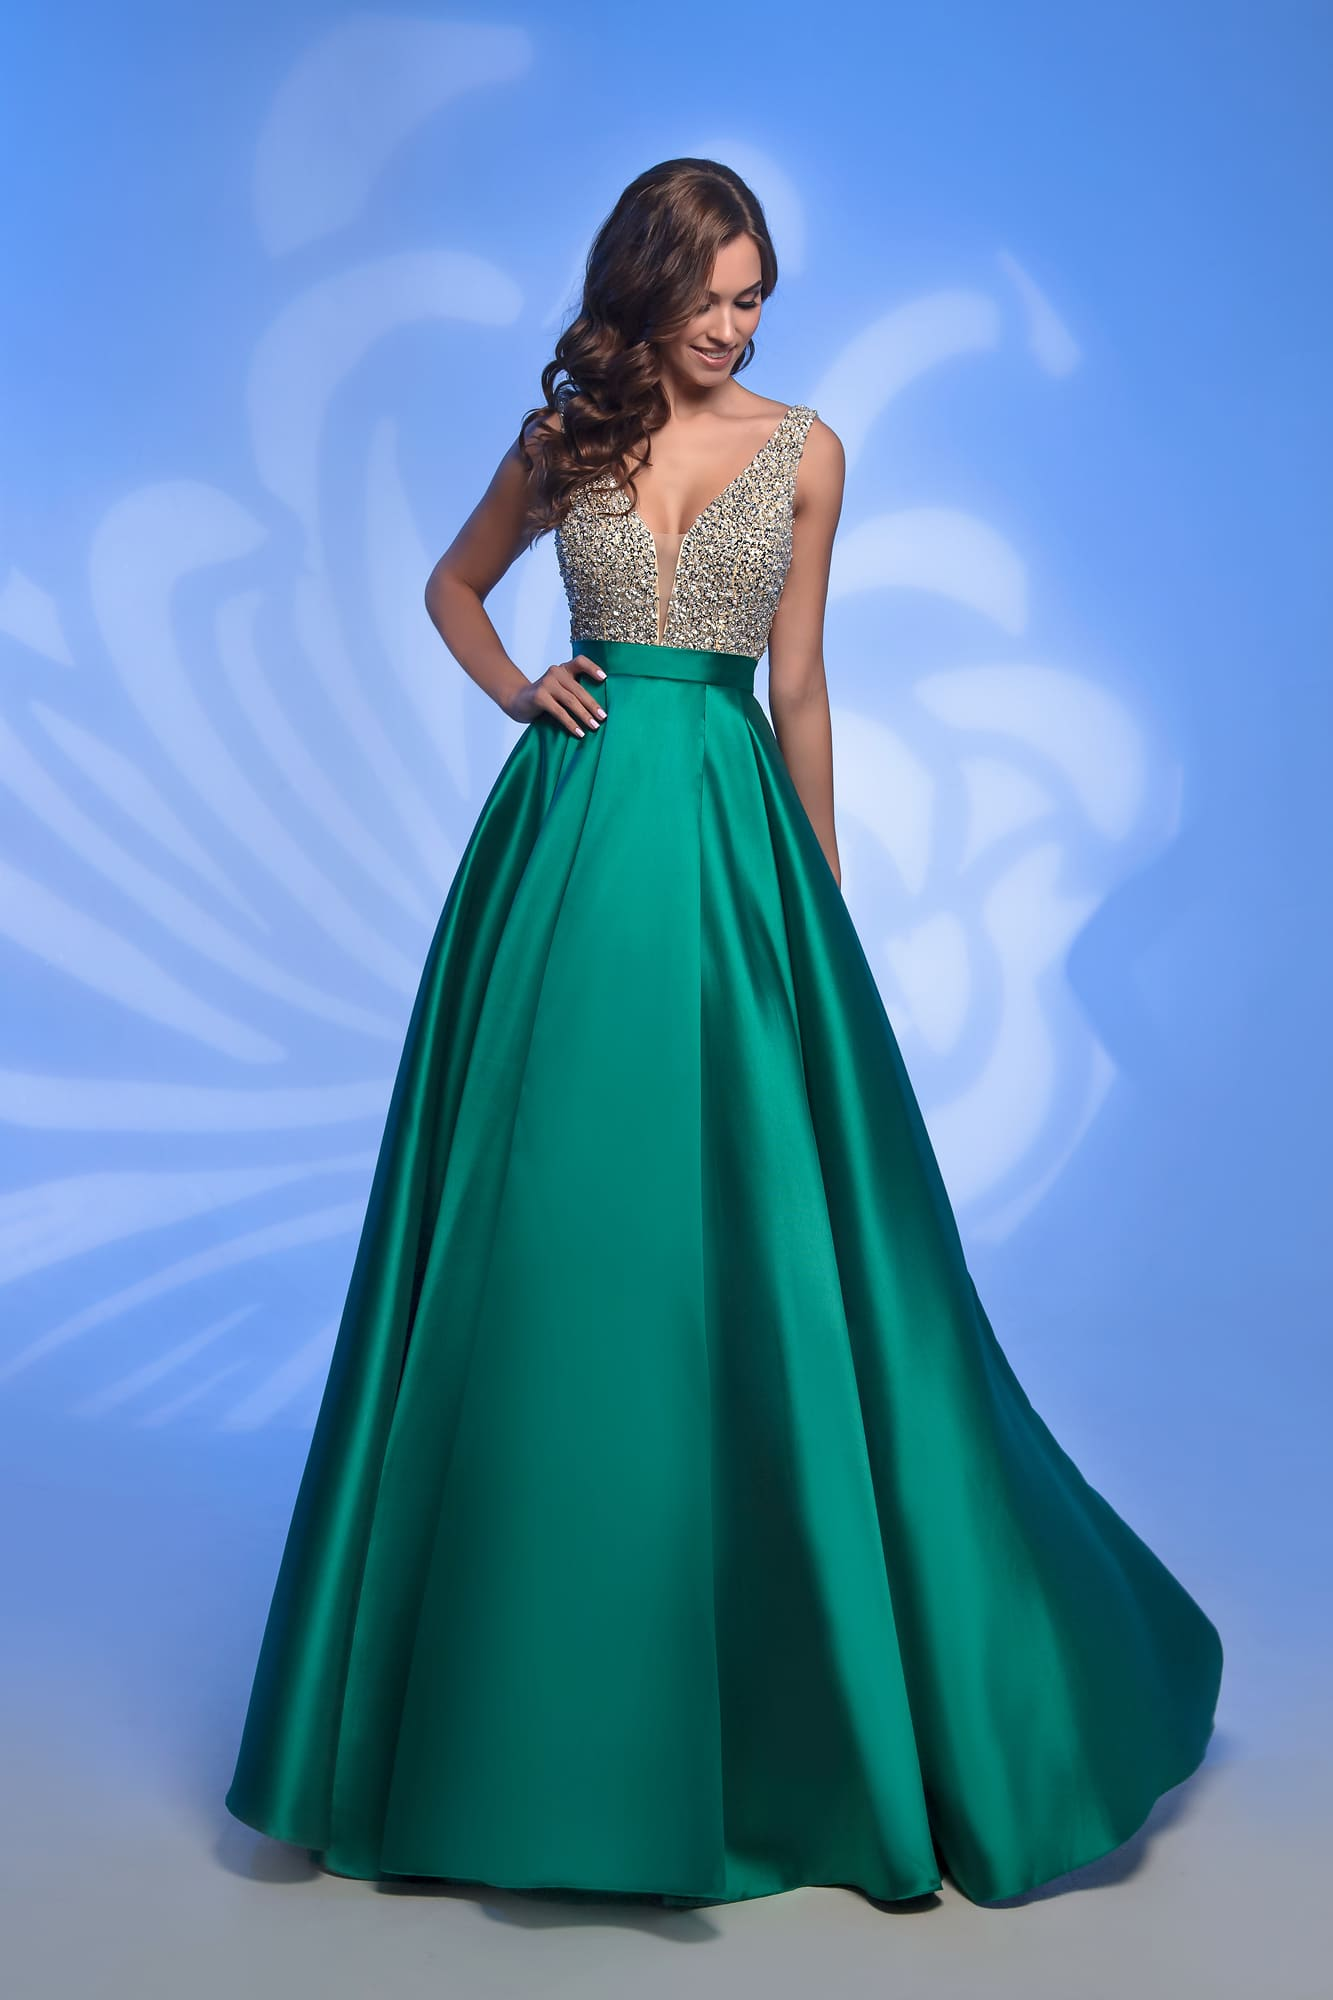 fa2bc9ccdf72161 Зеленое платье Nora Naviano 32382 green ▷ Свадебный Торговый Центр ...